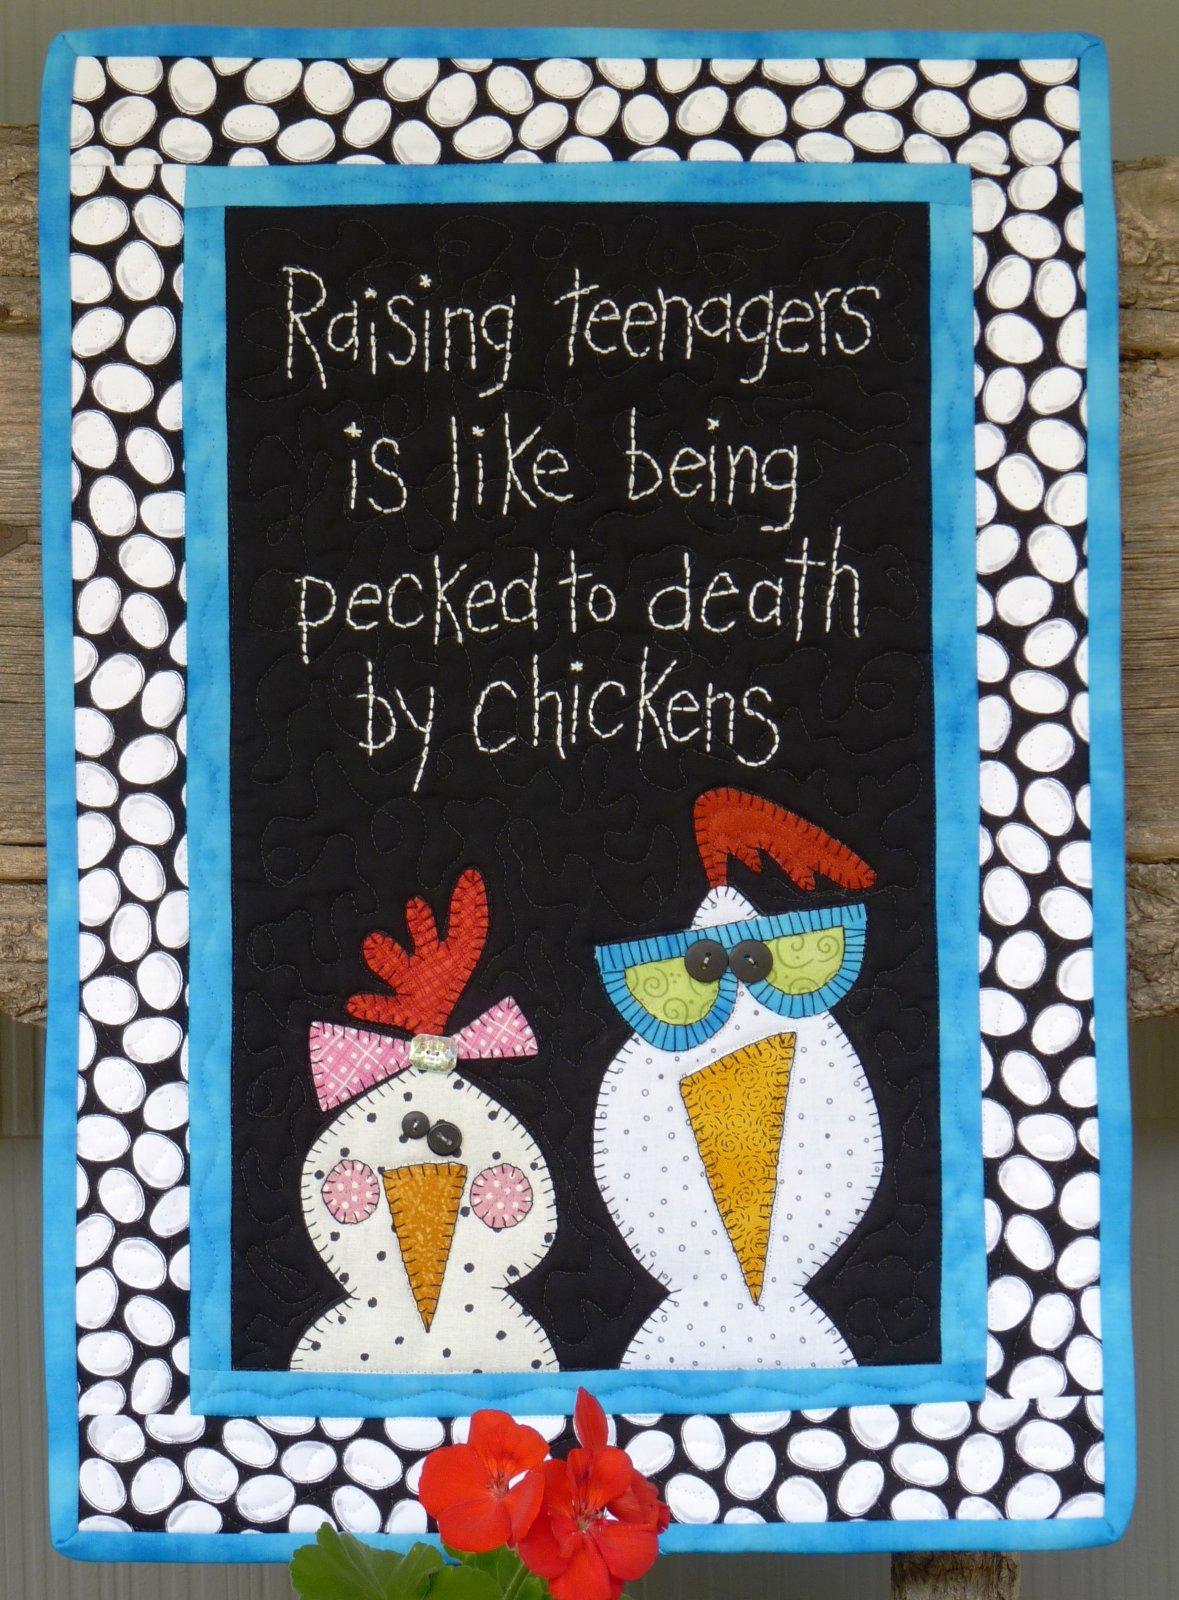 K615 Raising Teenagers - Kit